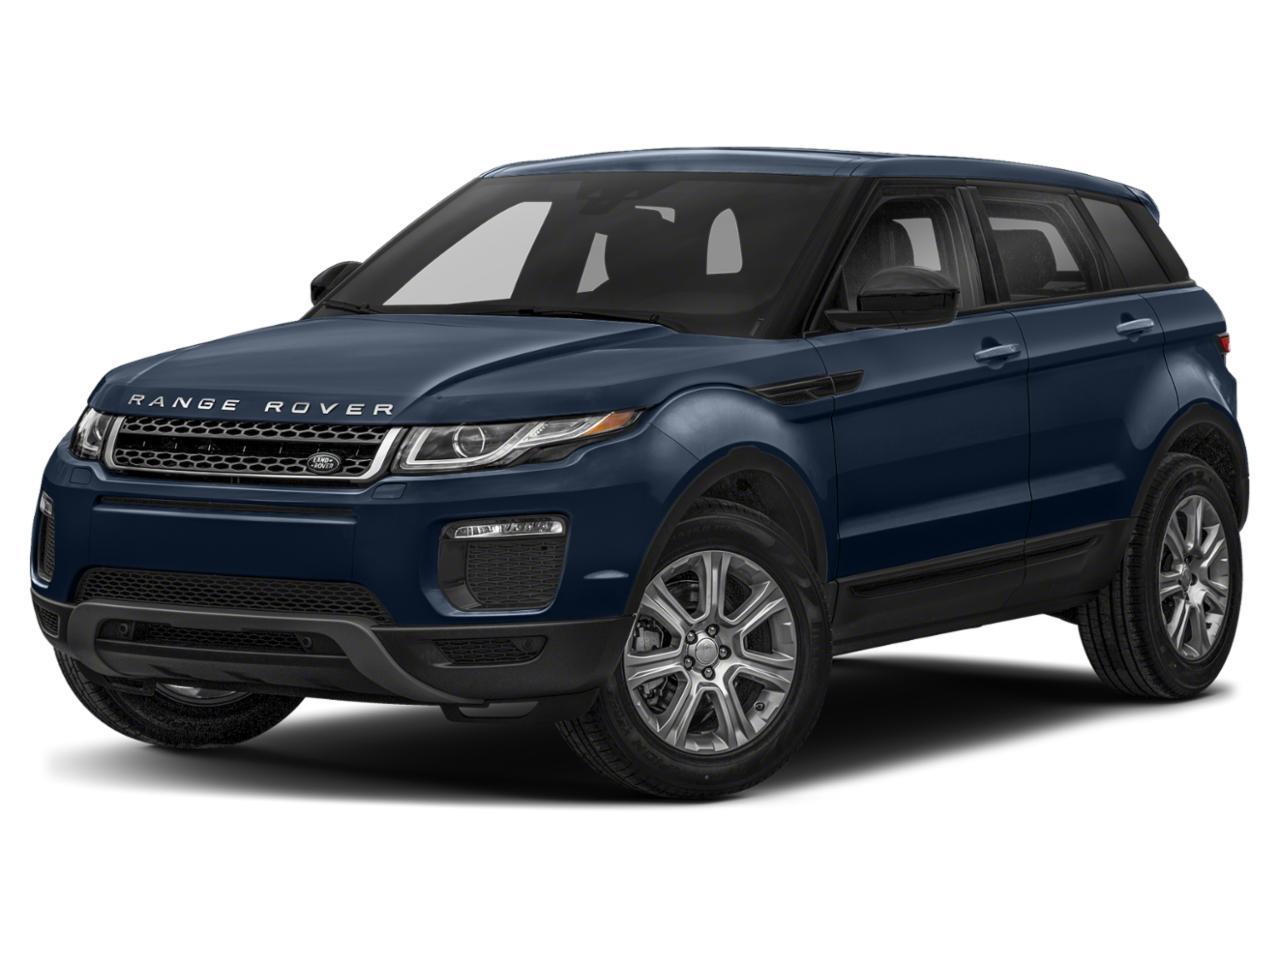 2019 Land Rover Range Rover Evoque Vehicle Photo in Tucson, AZ 85705